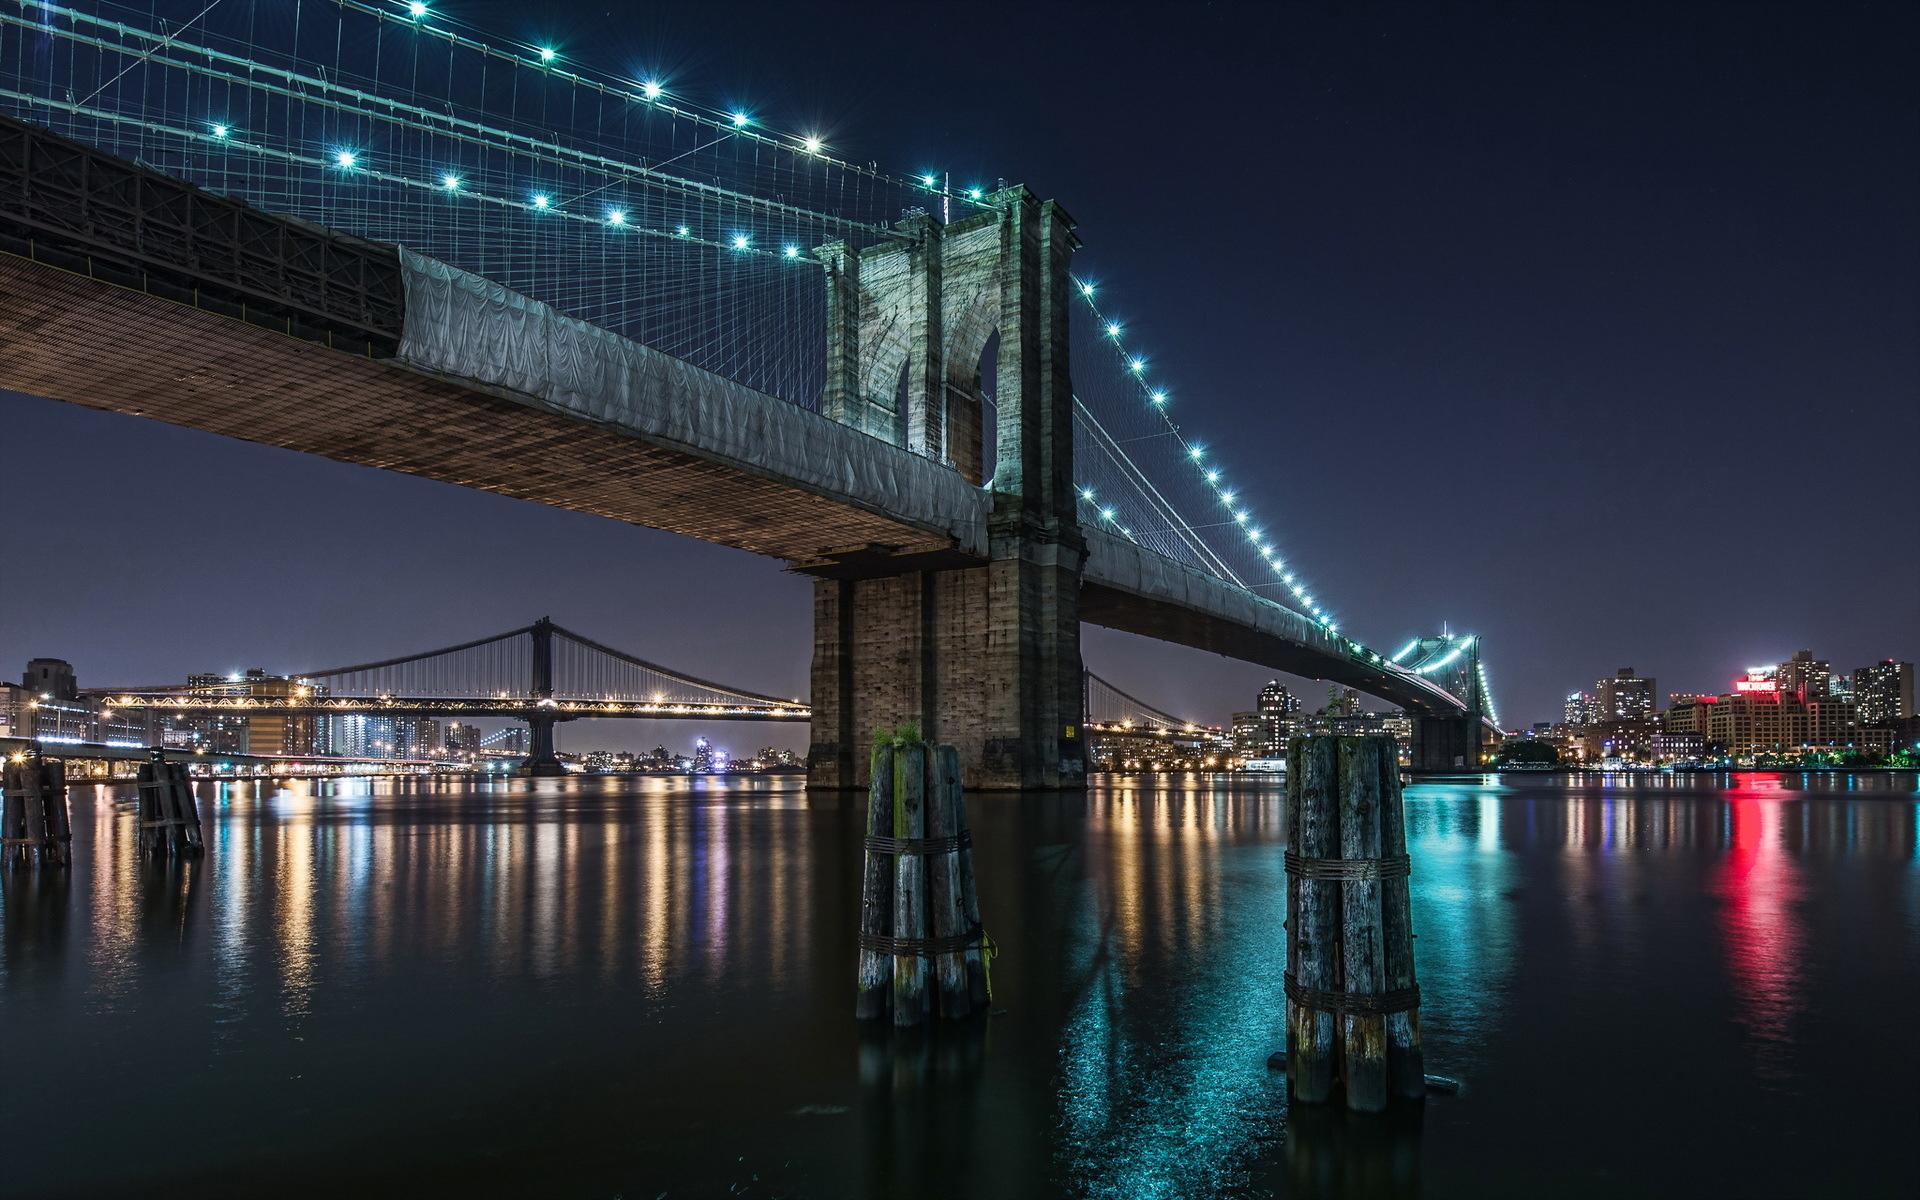 Brooklyn Bridge Wallpaper for Desktop 1920x1200